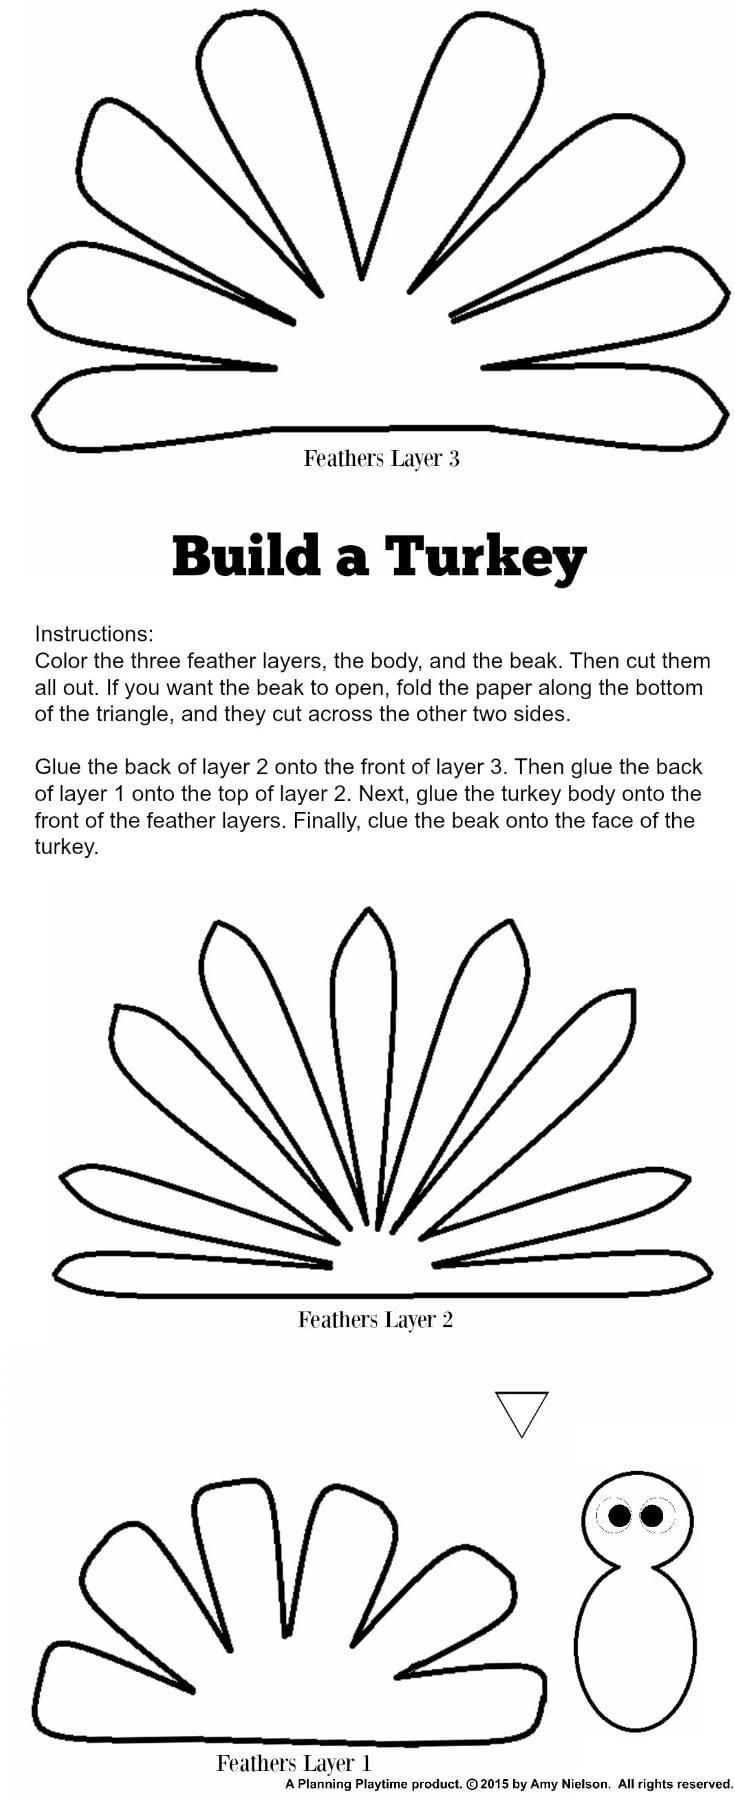 Cute Turkey Craft W/ Free Printable Template - Planning Playtime - Free Turkey Cut Out Printable